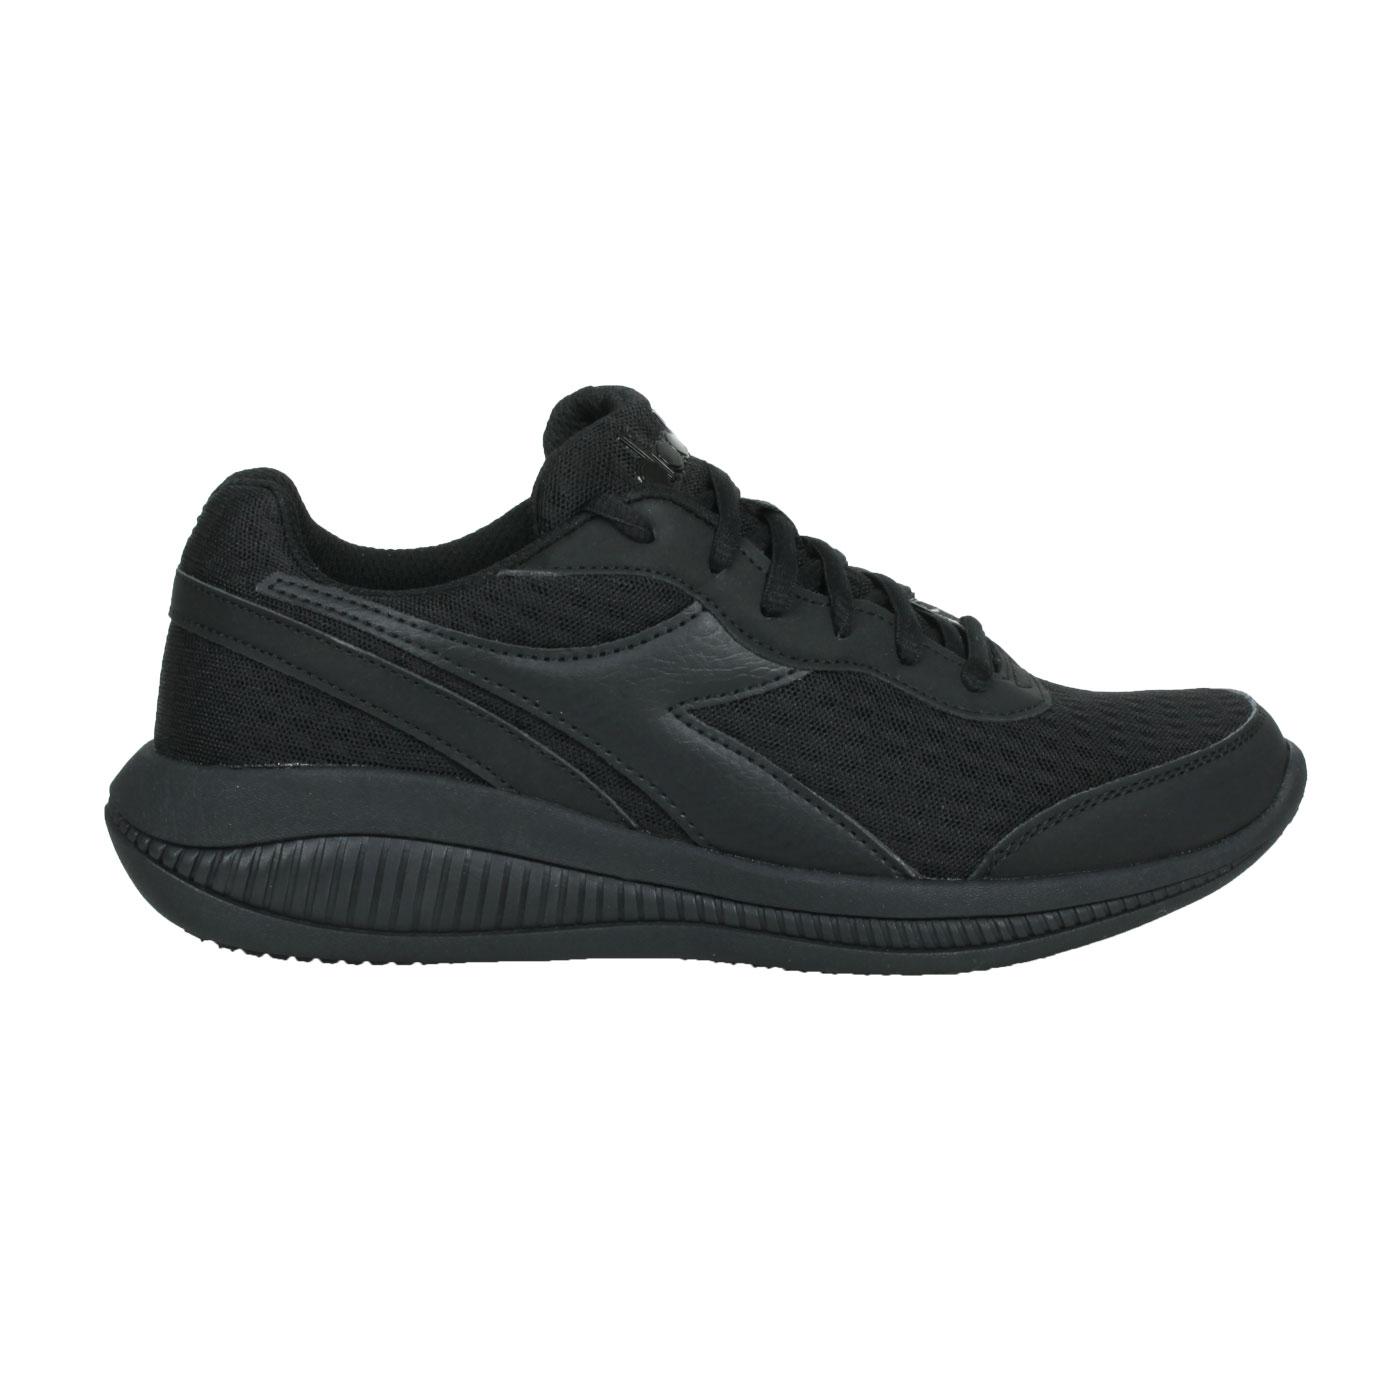 DIADORA 男款進口慢跑鞋 DA176888-C0200